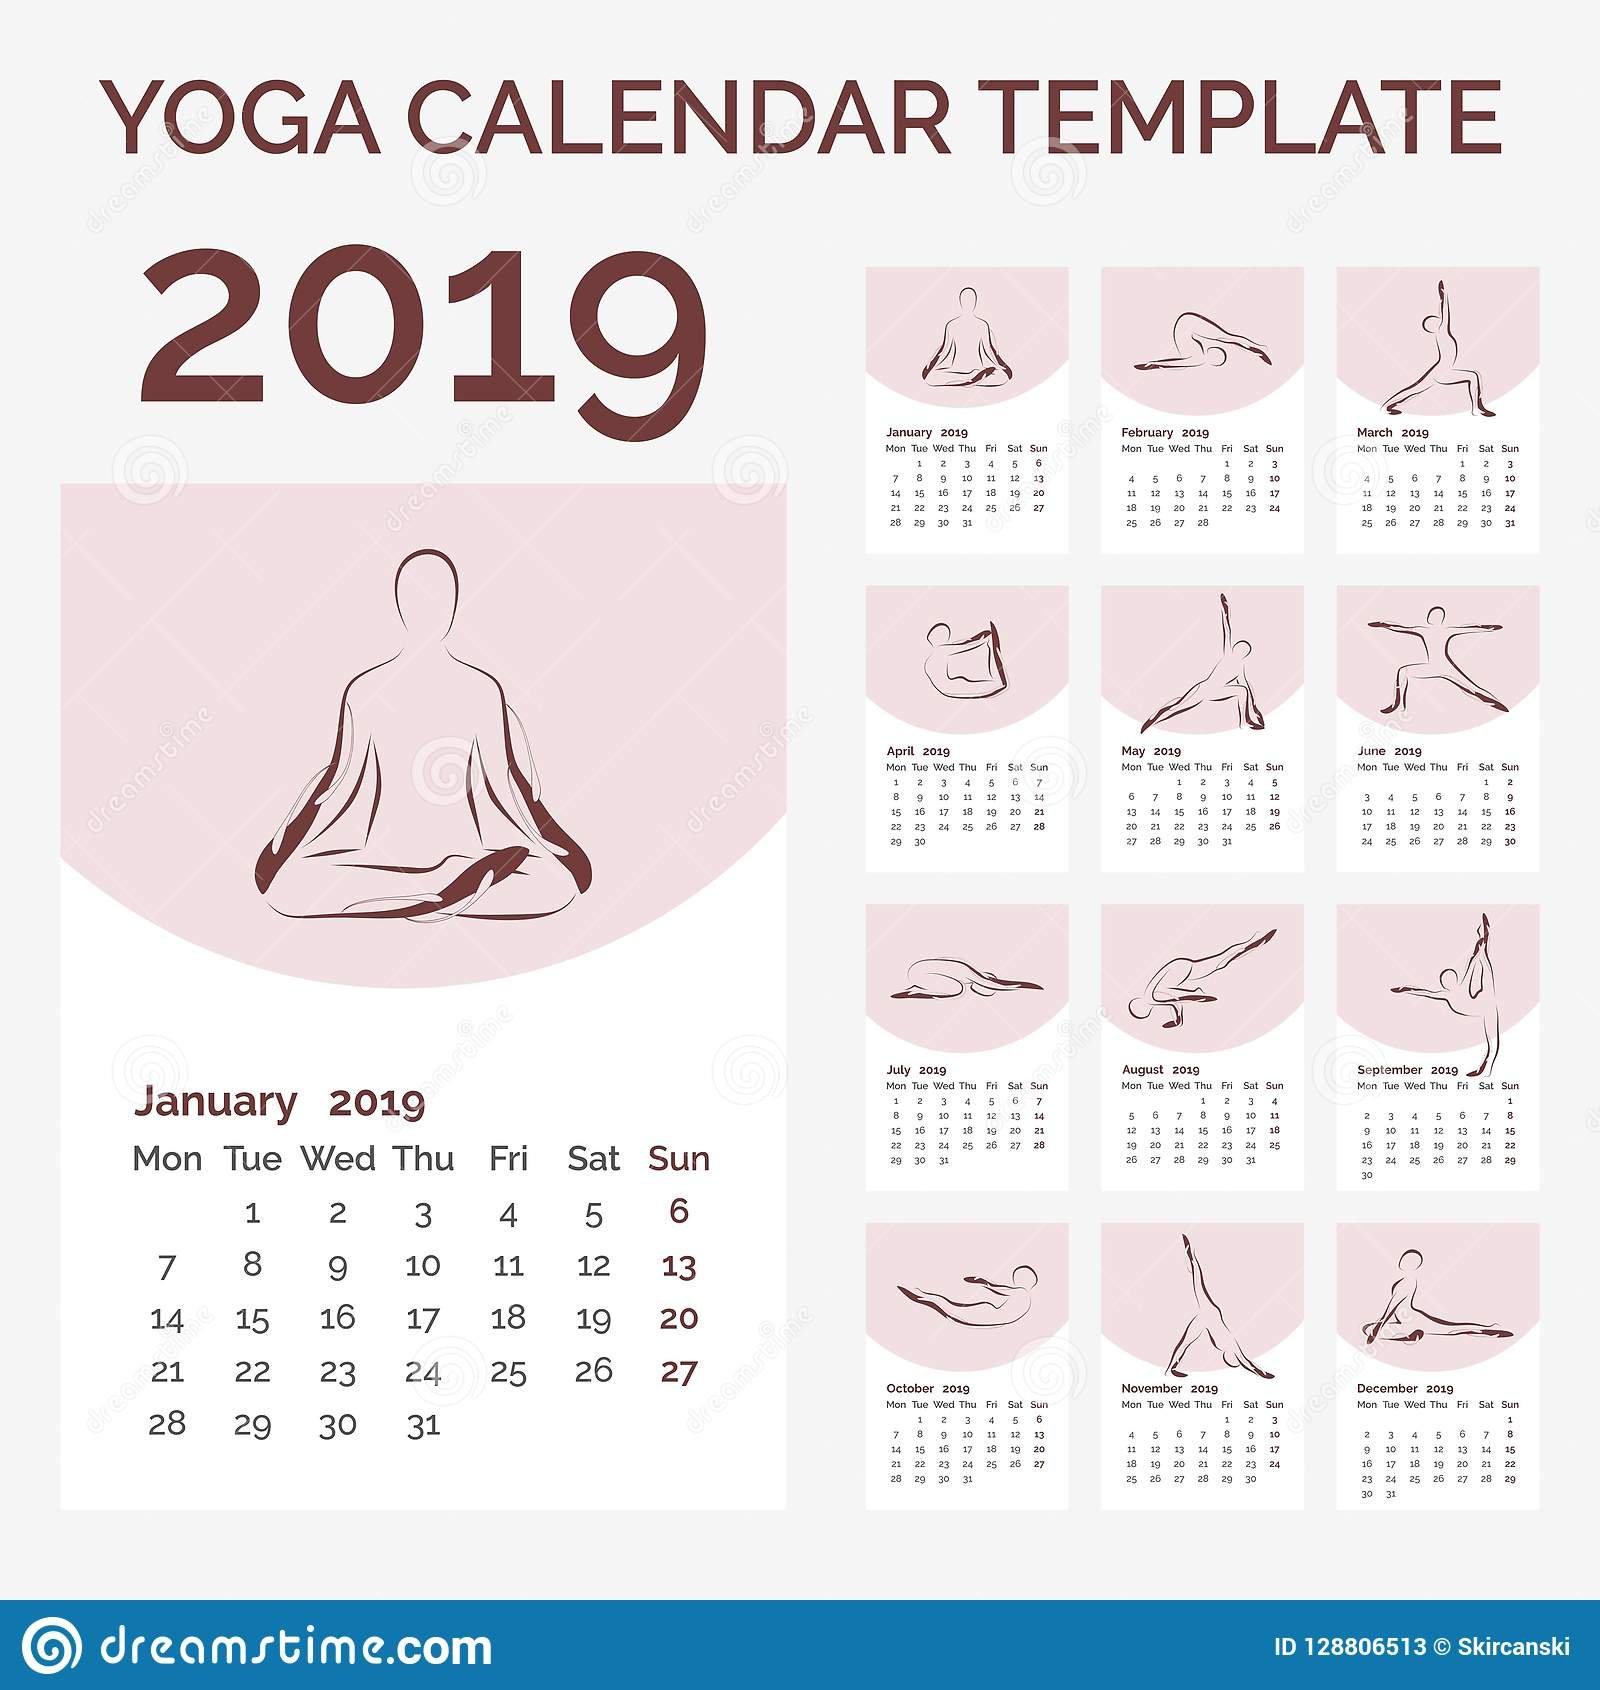 Calendar 2019 With Yoga Poses Vector Illustration Stock Vector Calendar 2019 Yoga